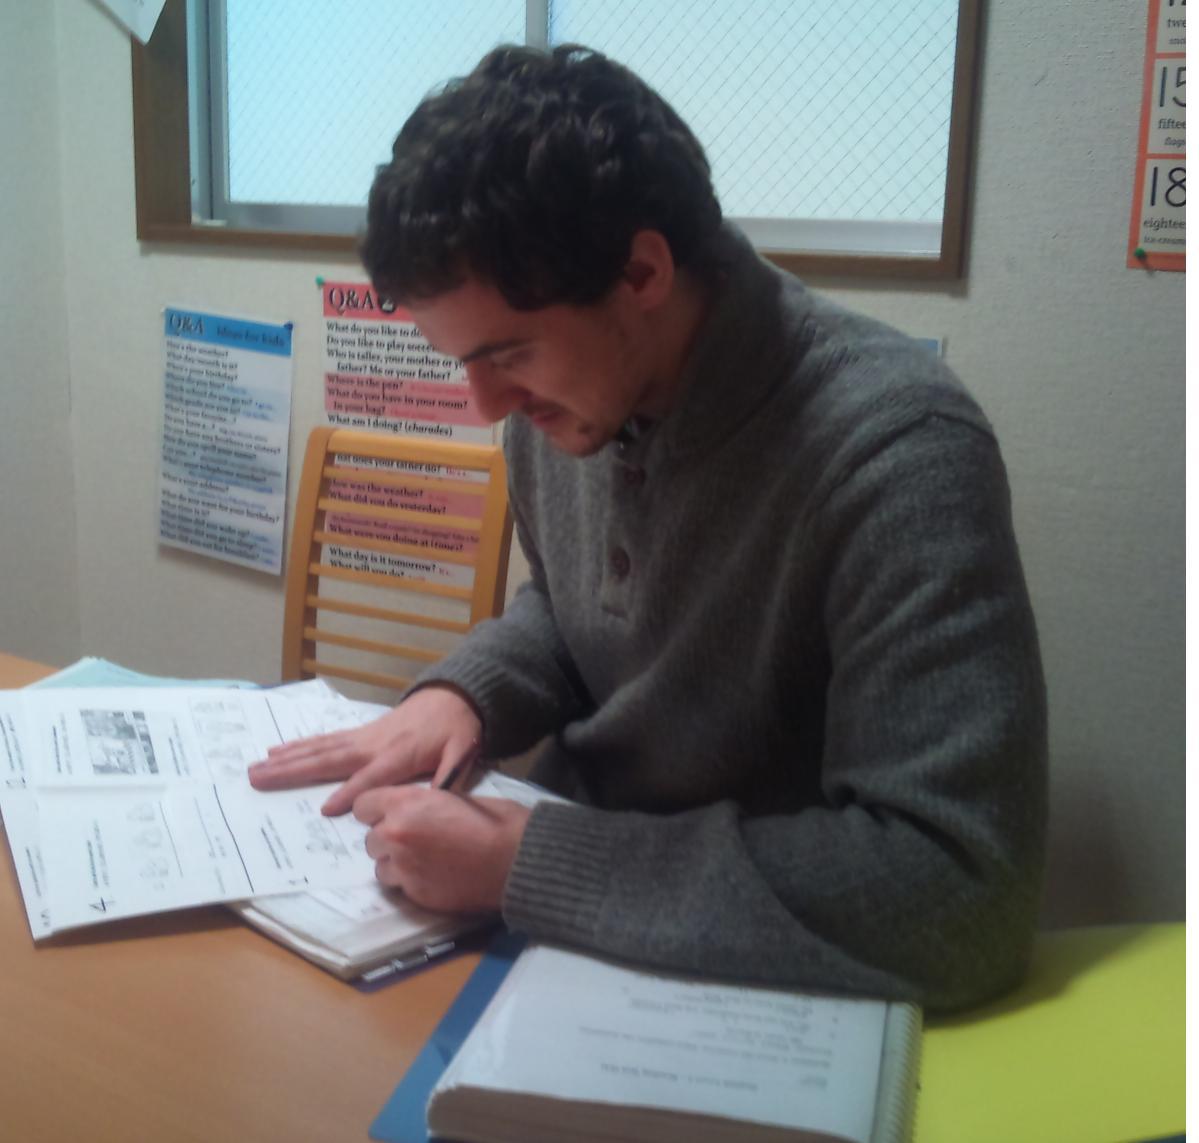 Jon Working